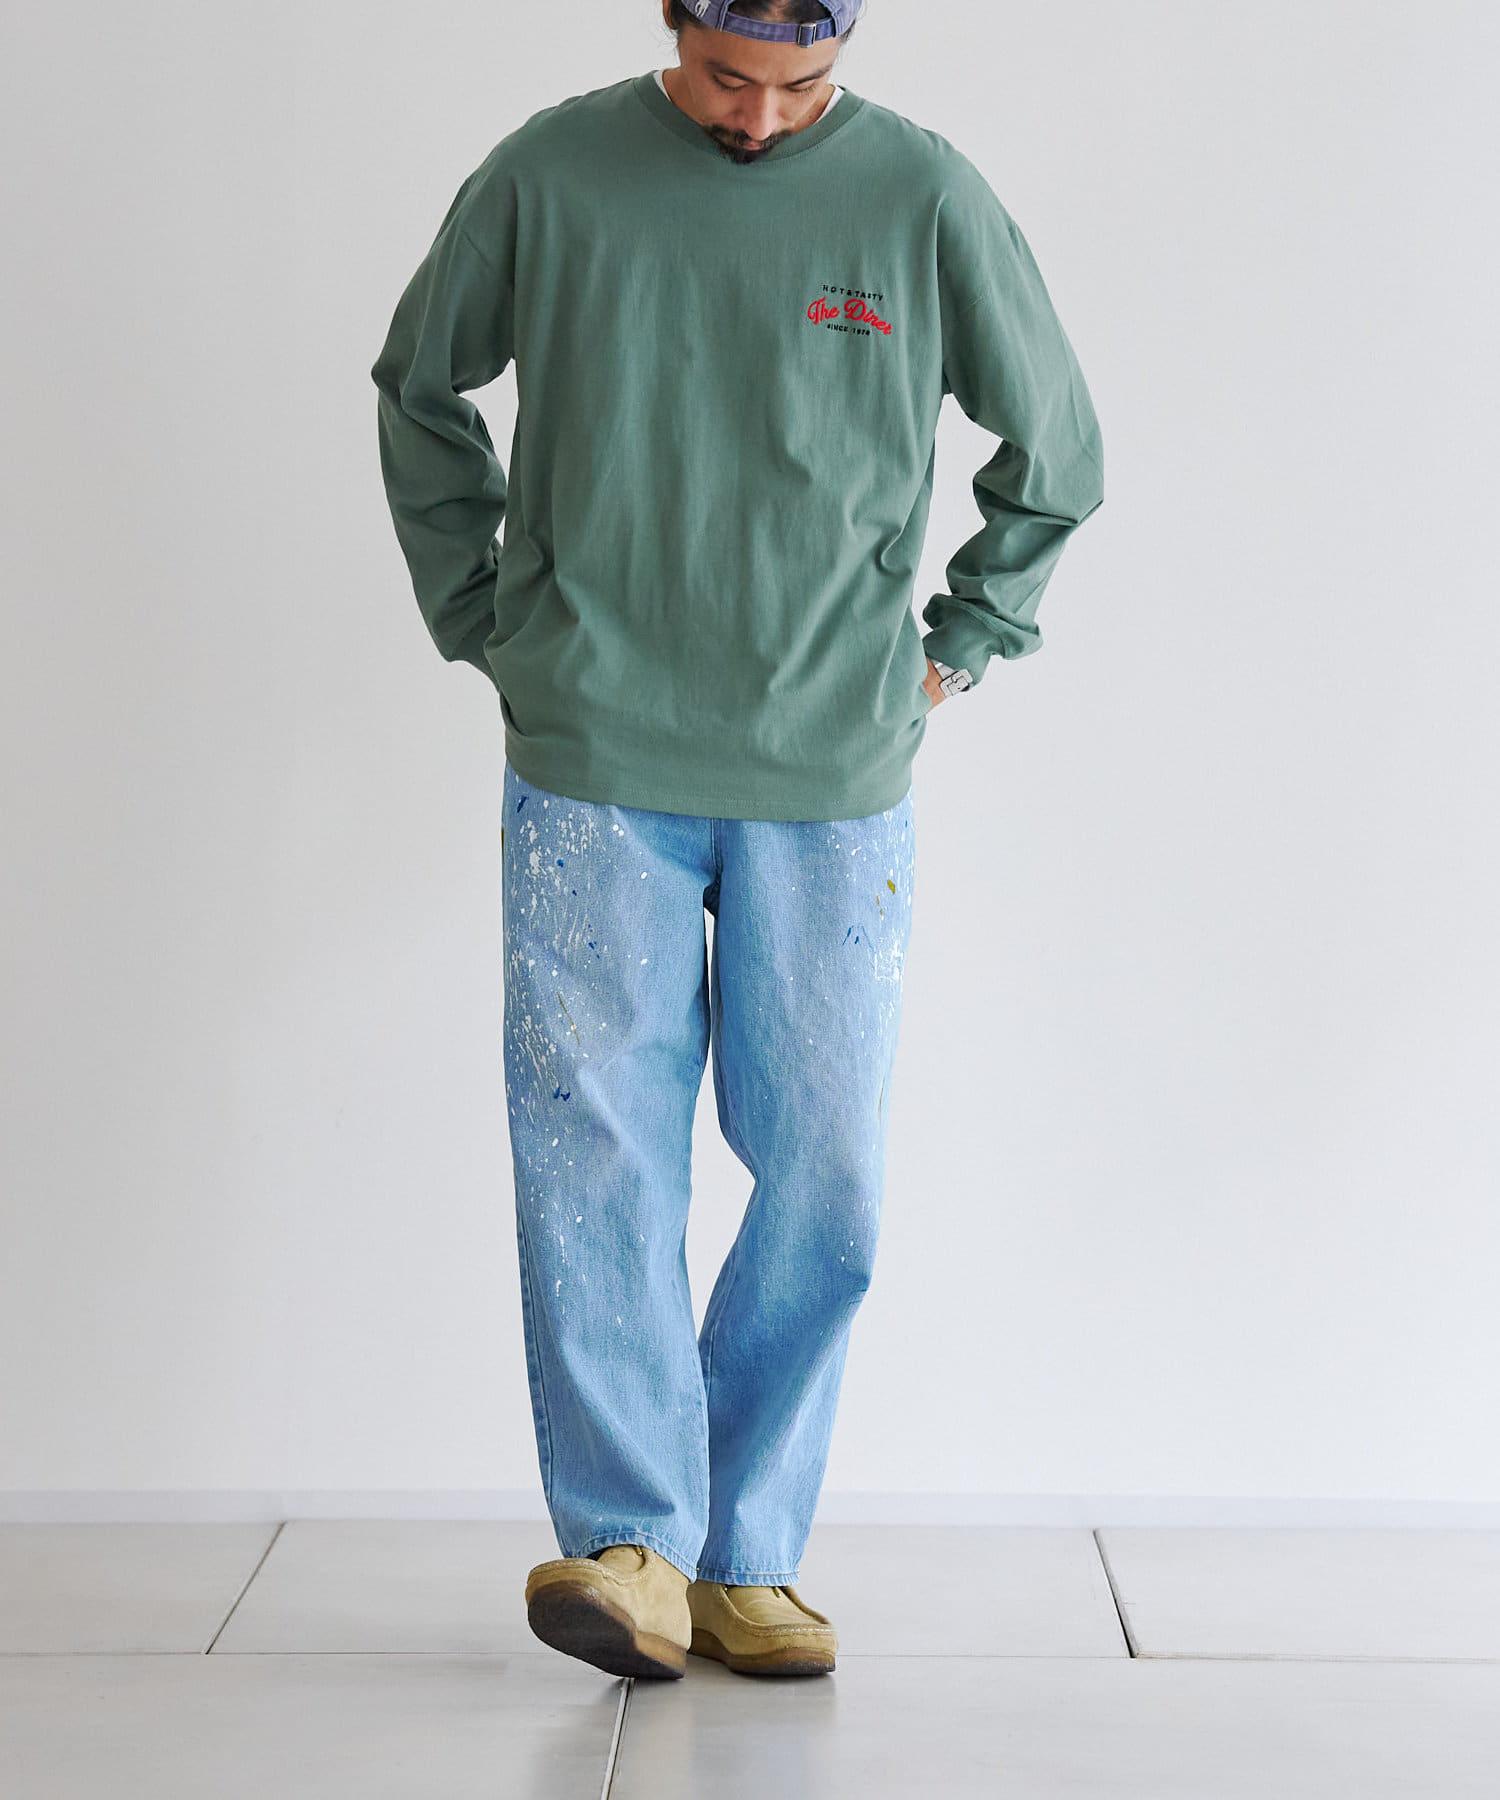 CPCM(シーピーシーエム) バックBURGER刺繍ロンT